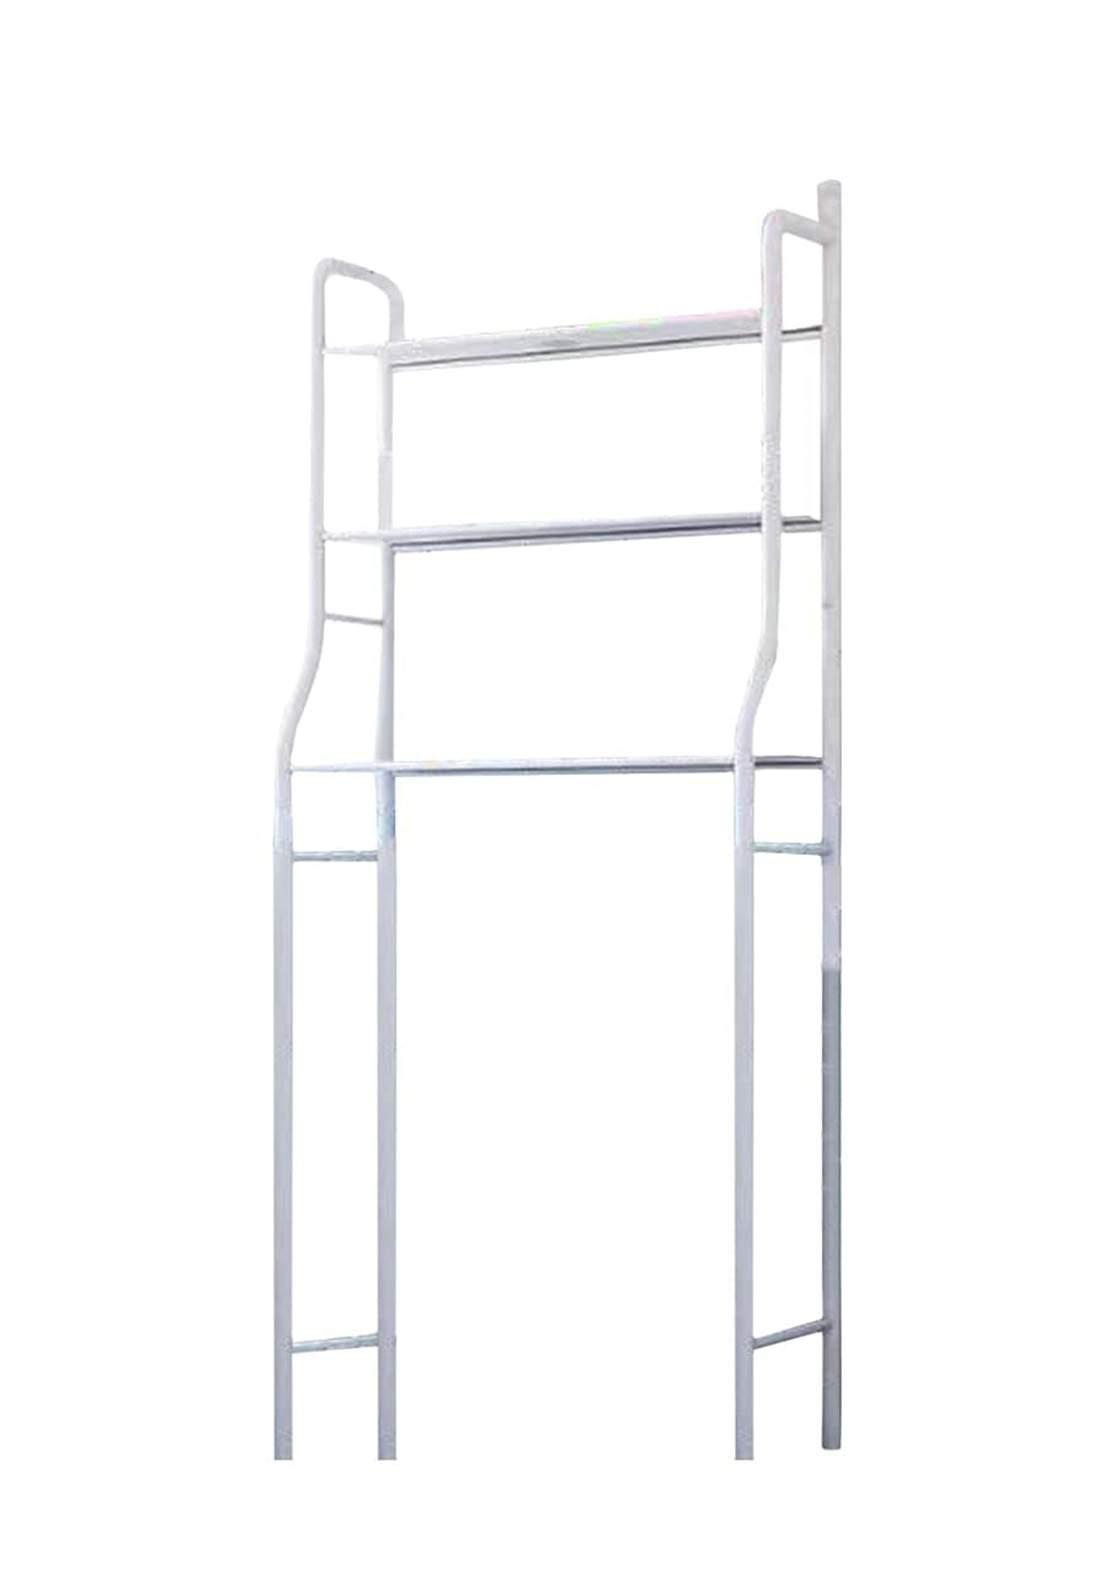 Fit Right 3-Shelf Bathroom Organizer Over The Toilet Storage, Bathroom Shelf Over Toilet رف متعدد الاستخدام